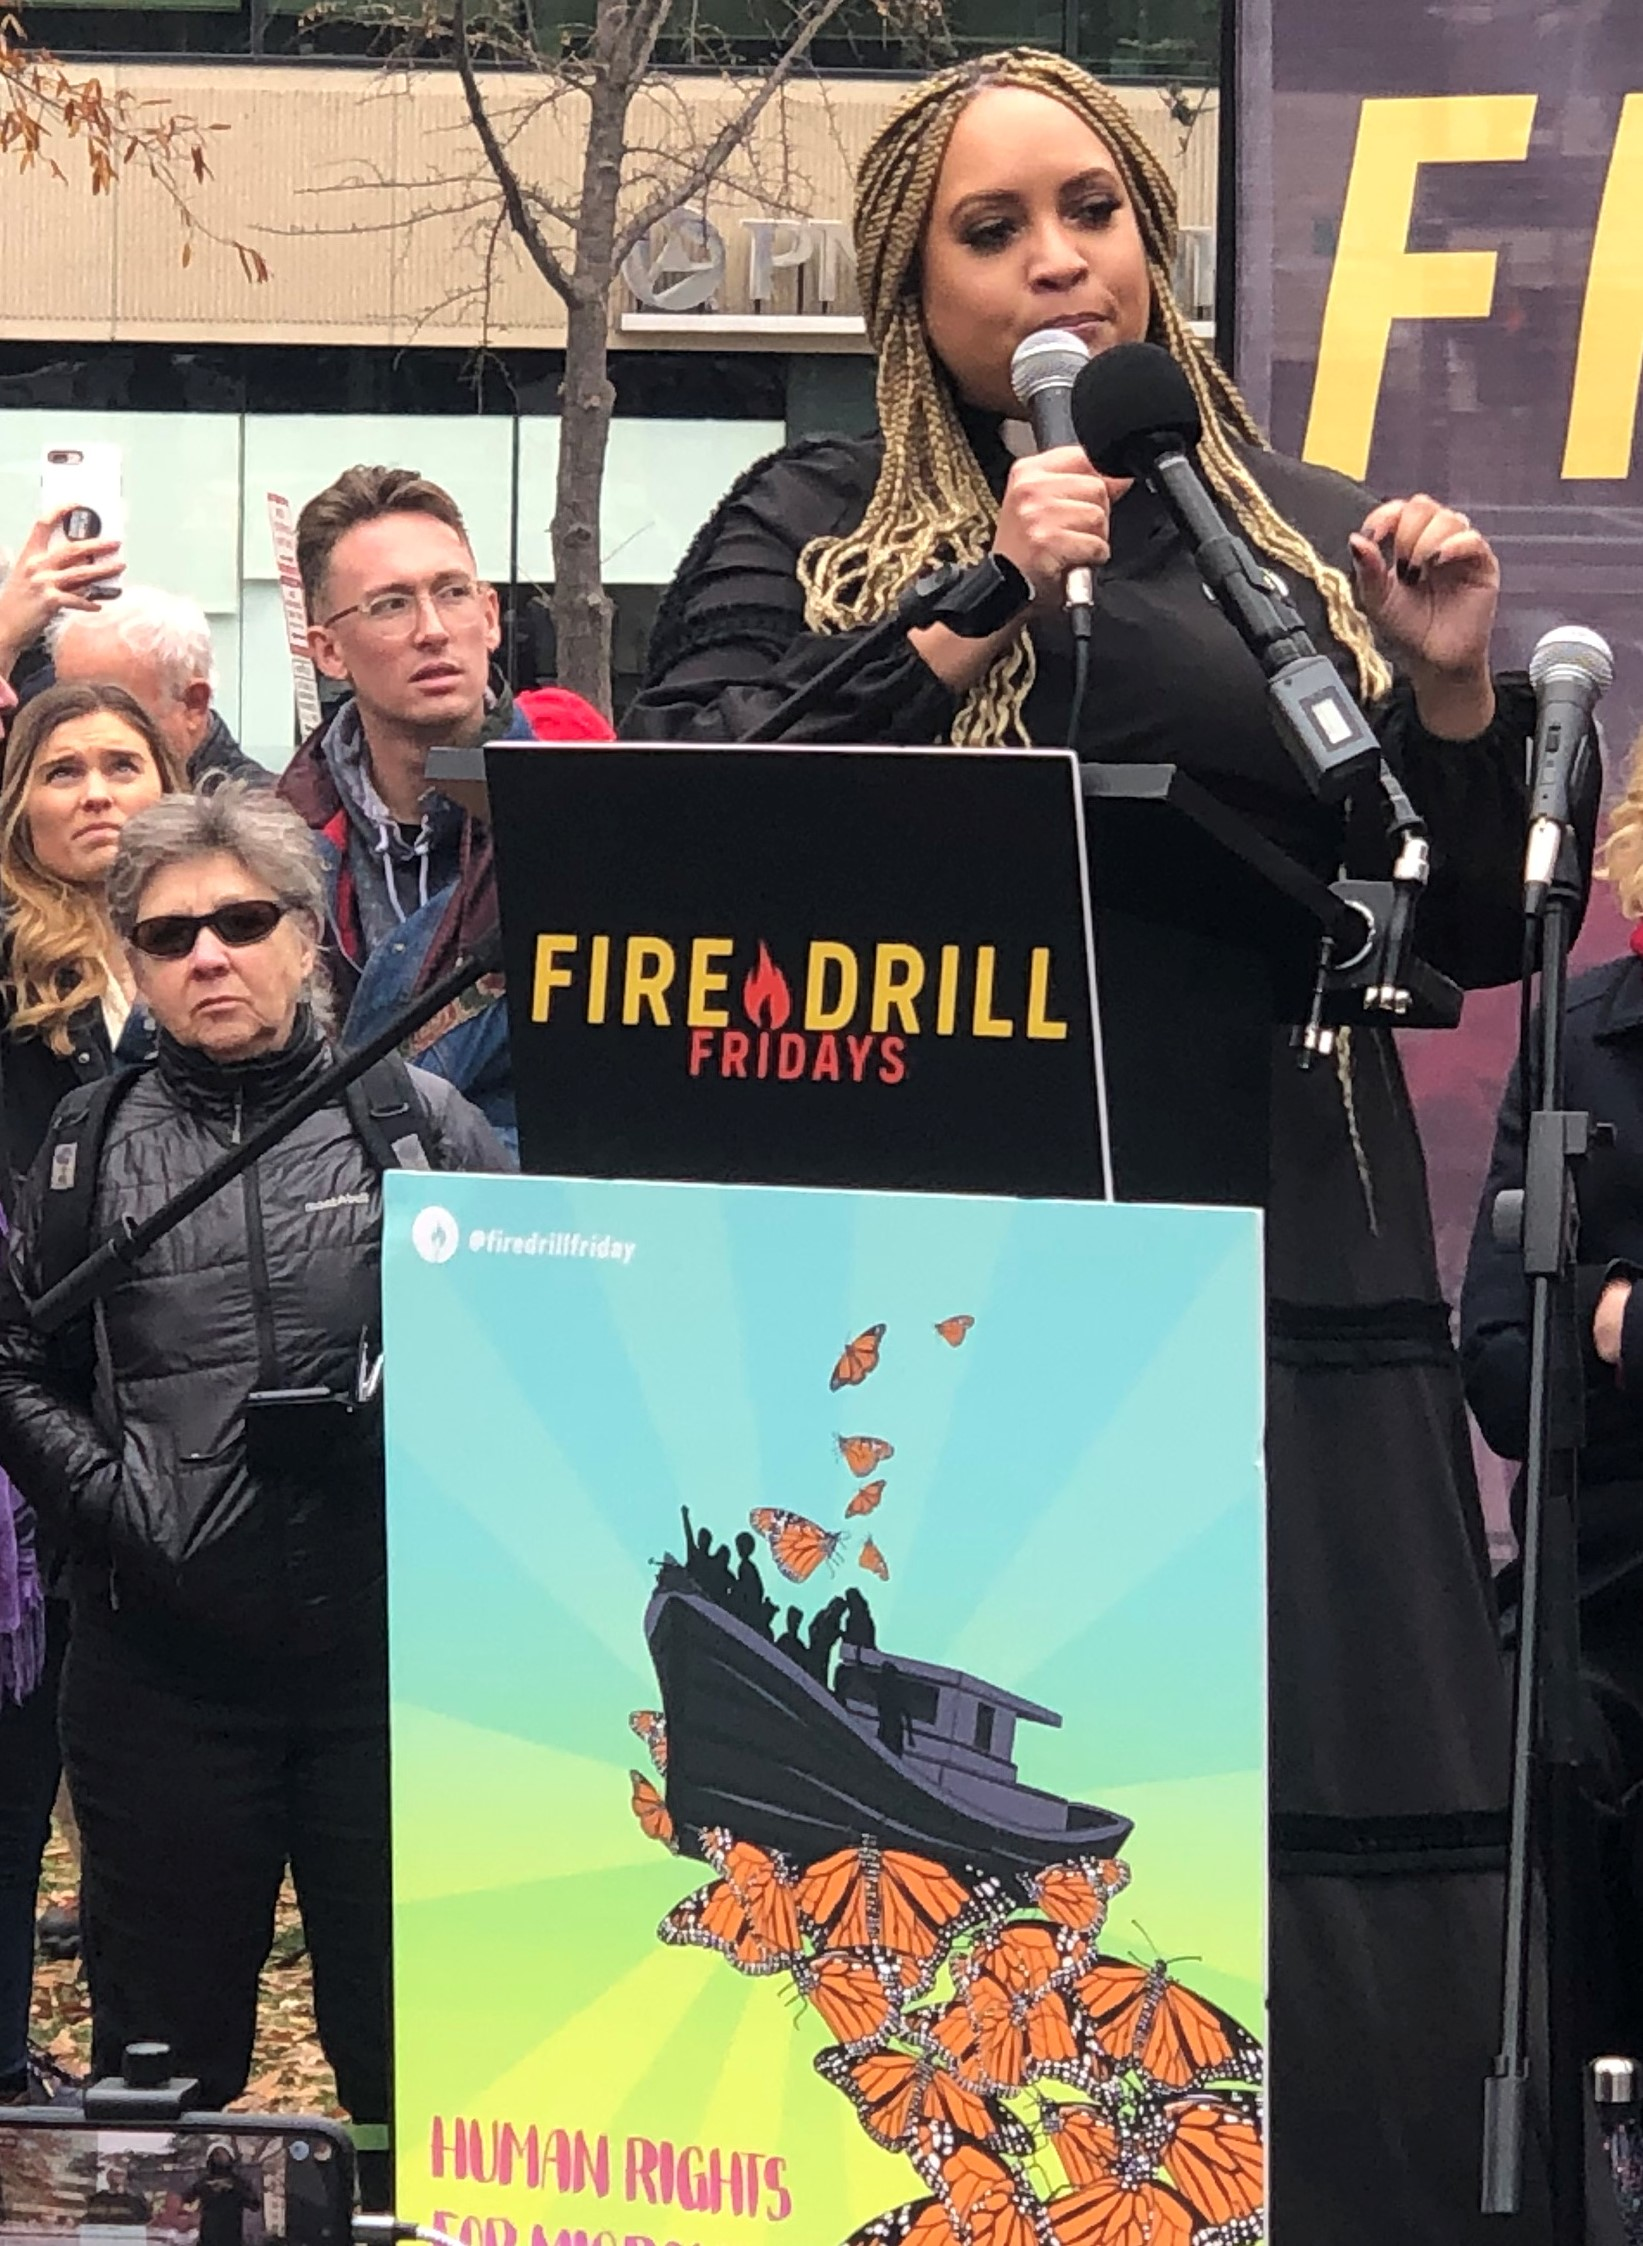 Dousa at Fire Drill Fridays podium 12/6/19 D.C.